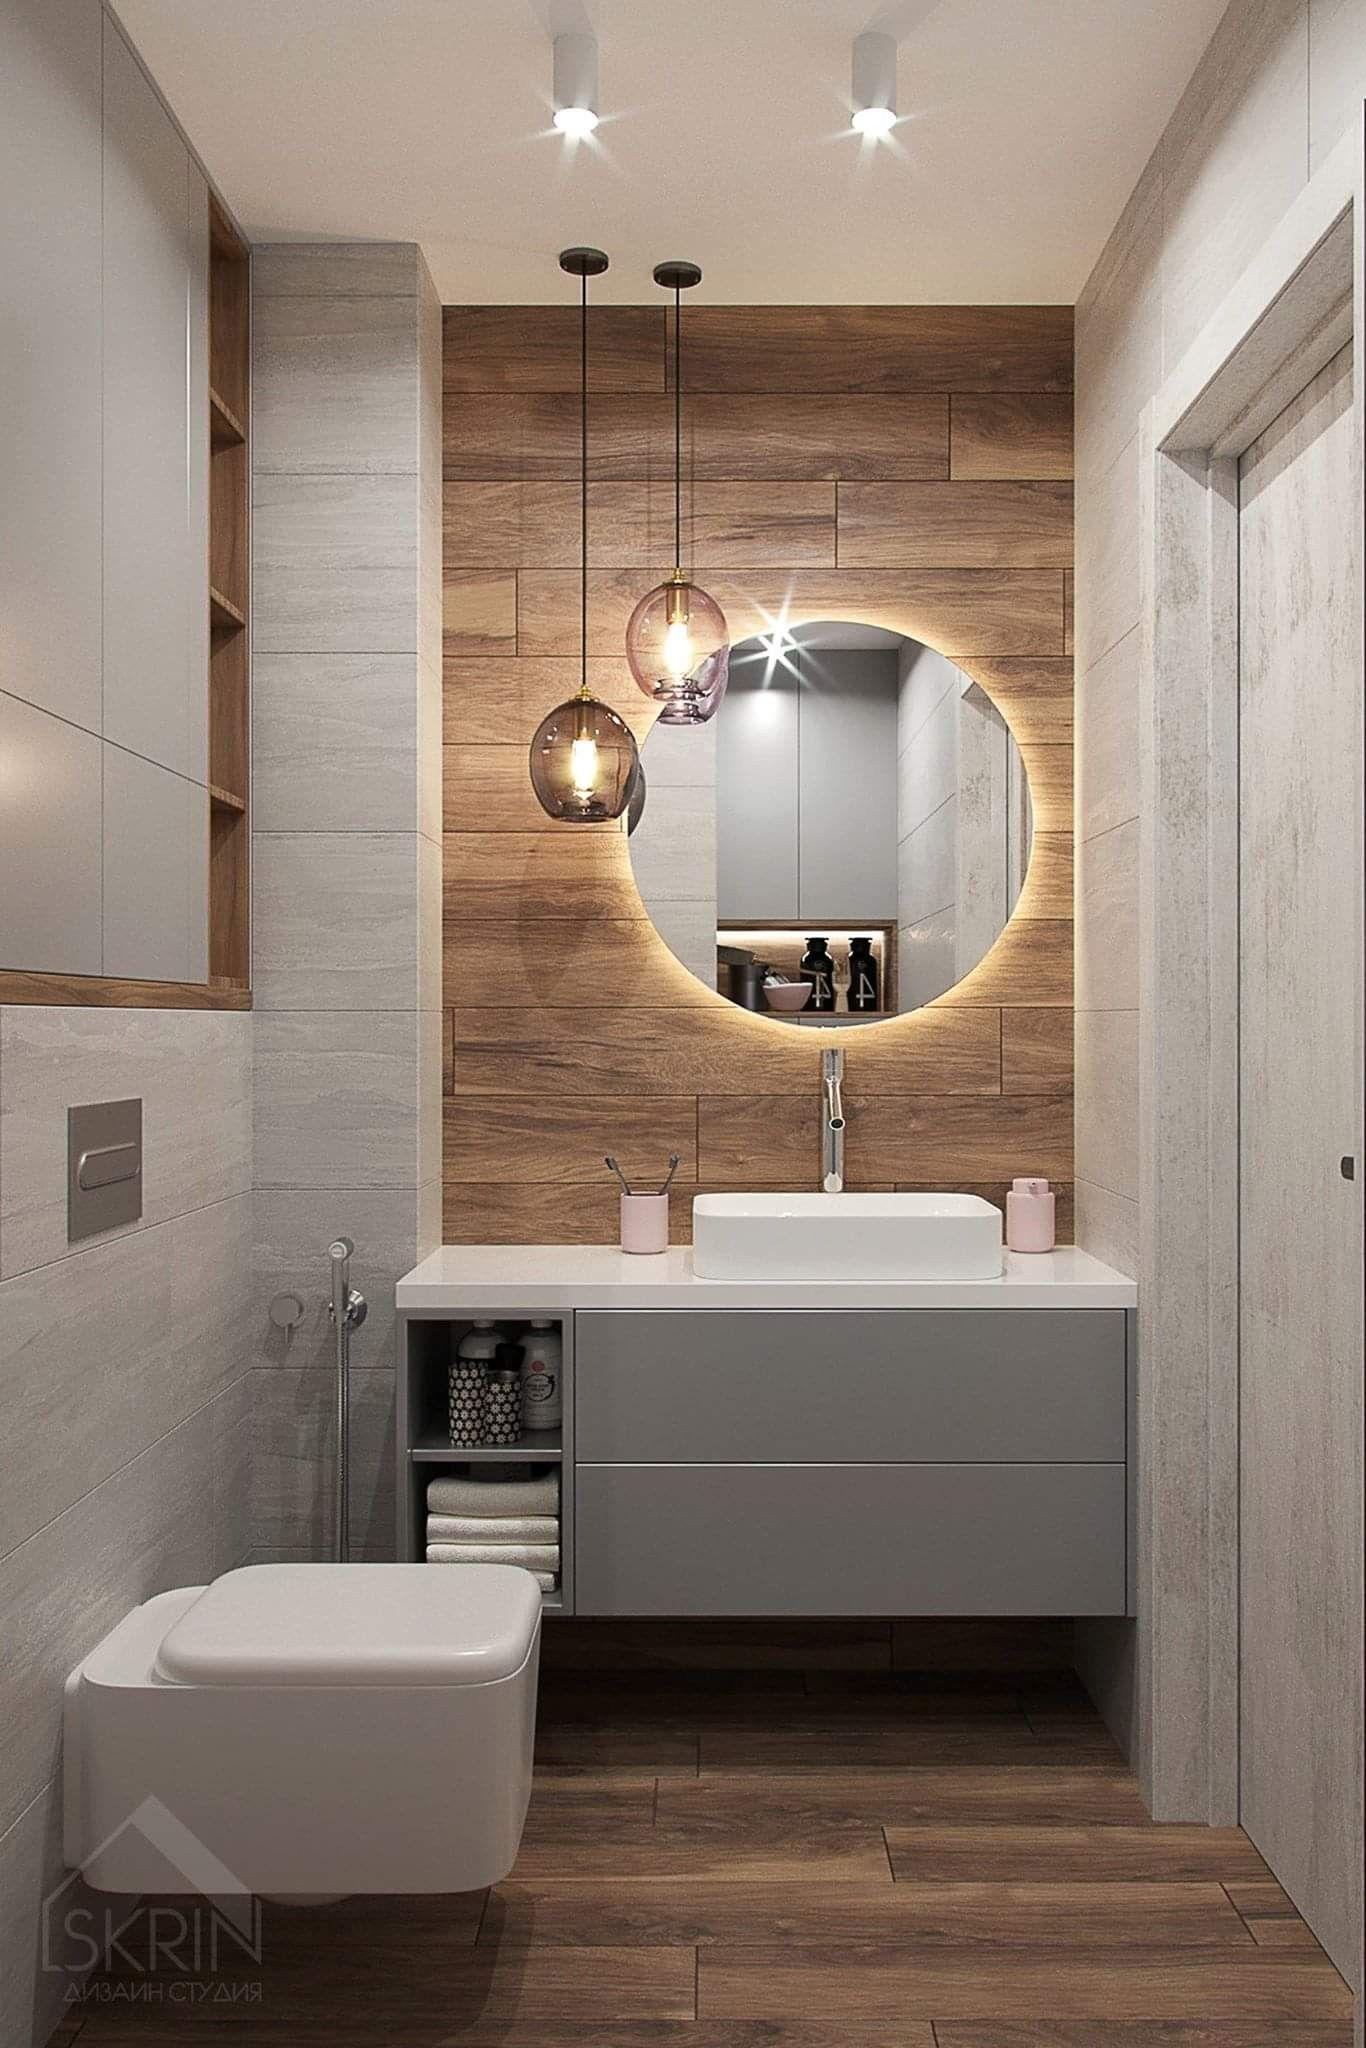 Contemporary Neutral Tile Warm Wood Tones Asymmetrical Contemporary Bathroom Tiles Bathroom Design Small Luxury Bathroom